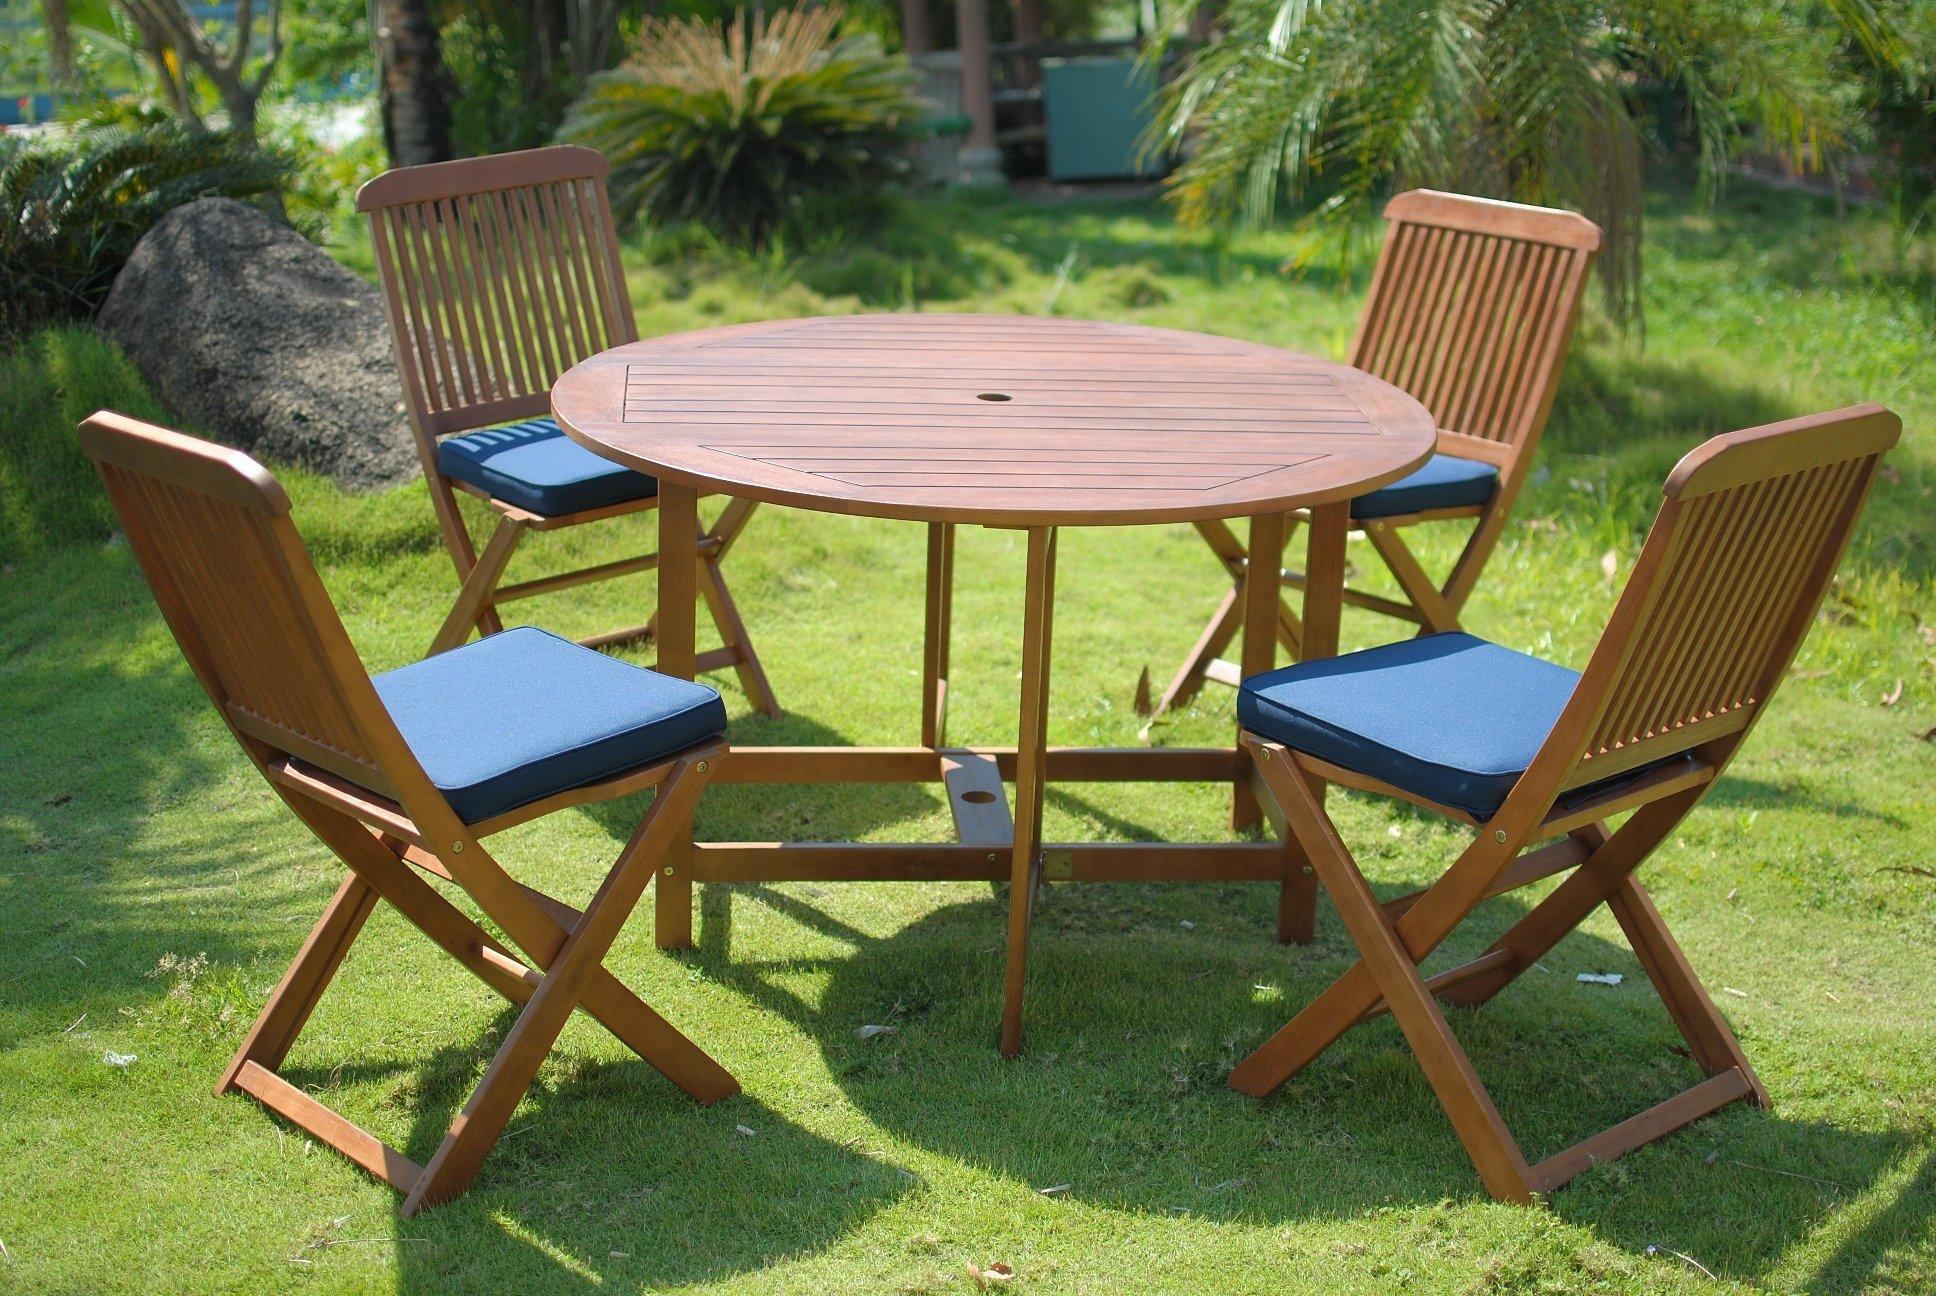 Elegance 4 Seater Folding Round Patio Dining Set Simply Wood